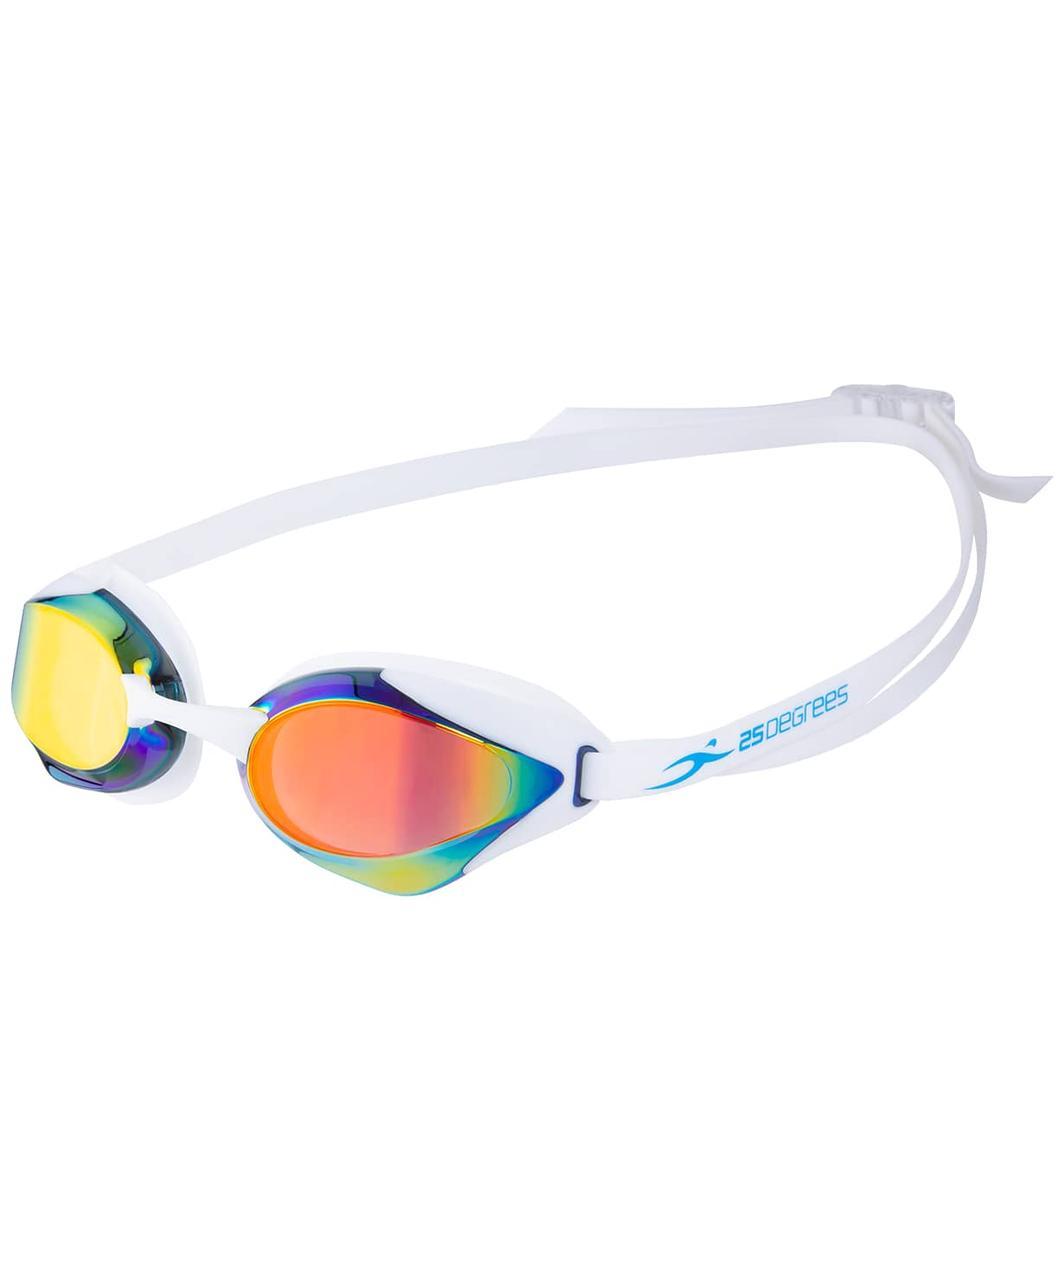 Очки для плавания Infase Mirrored White 25Degrees